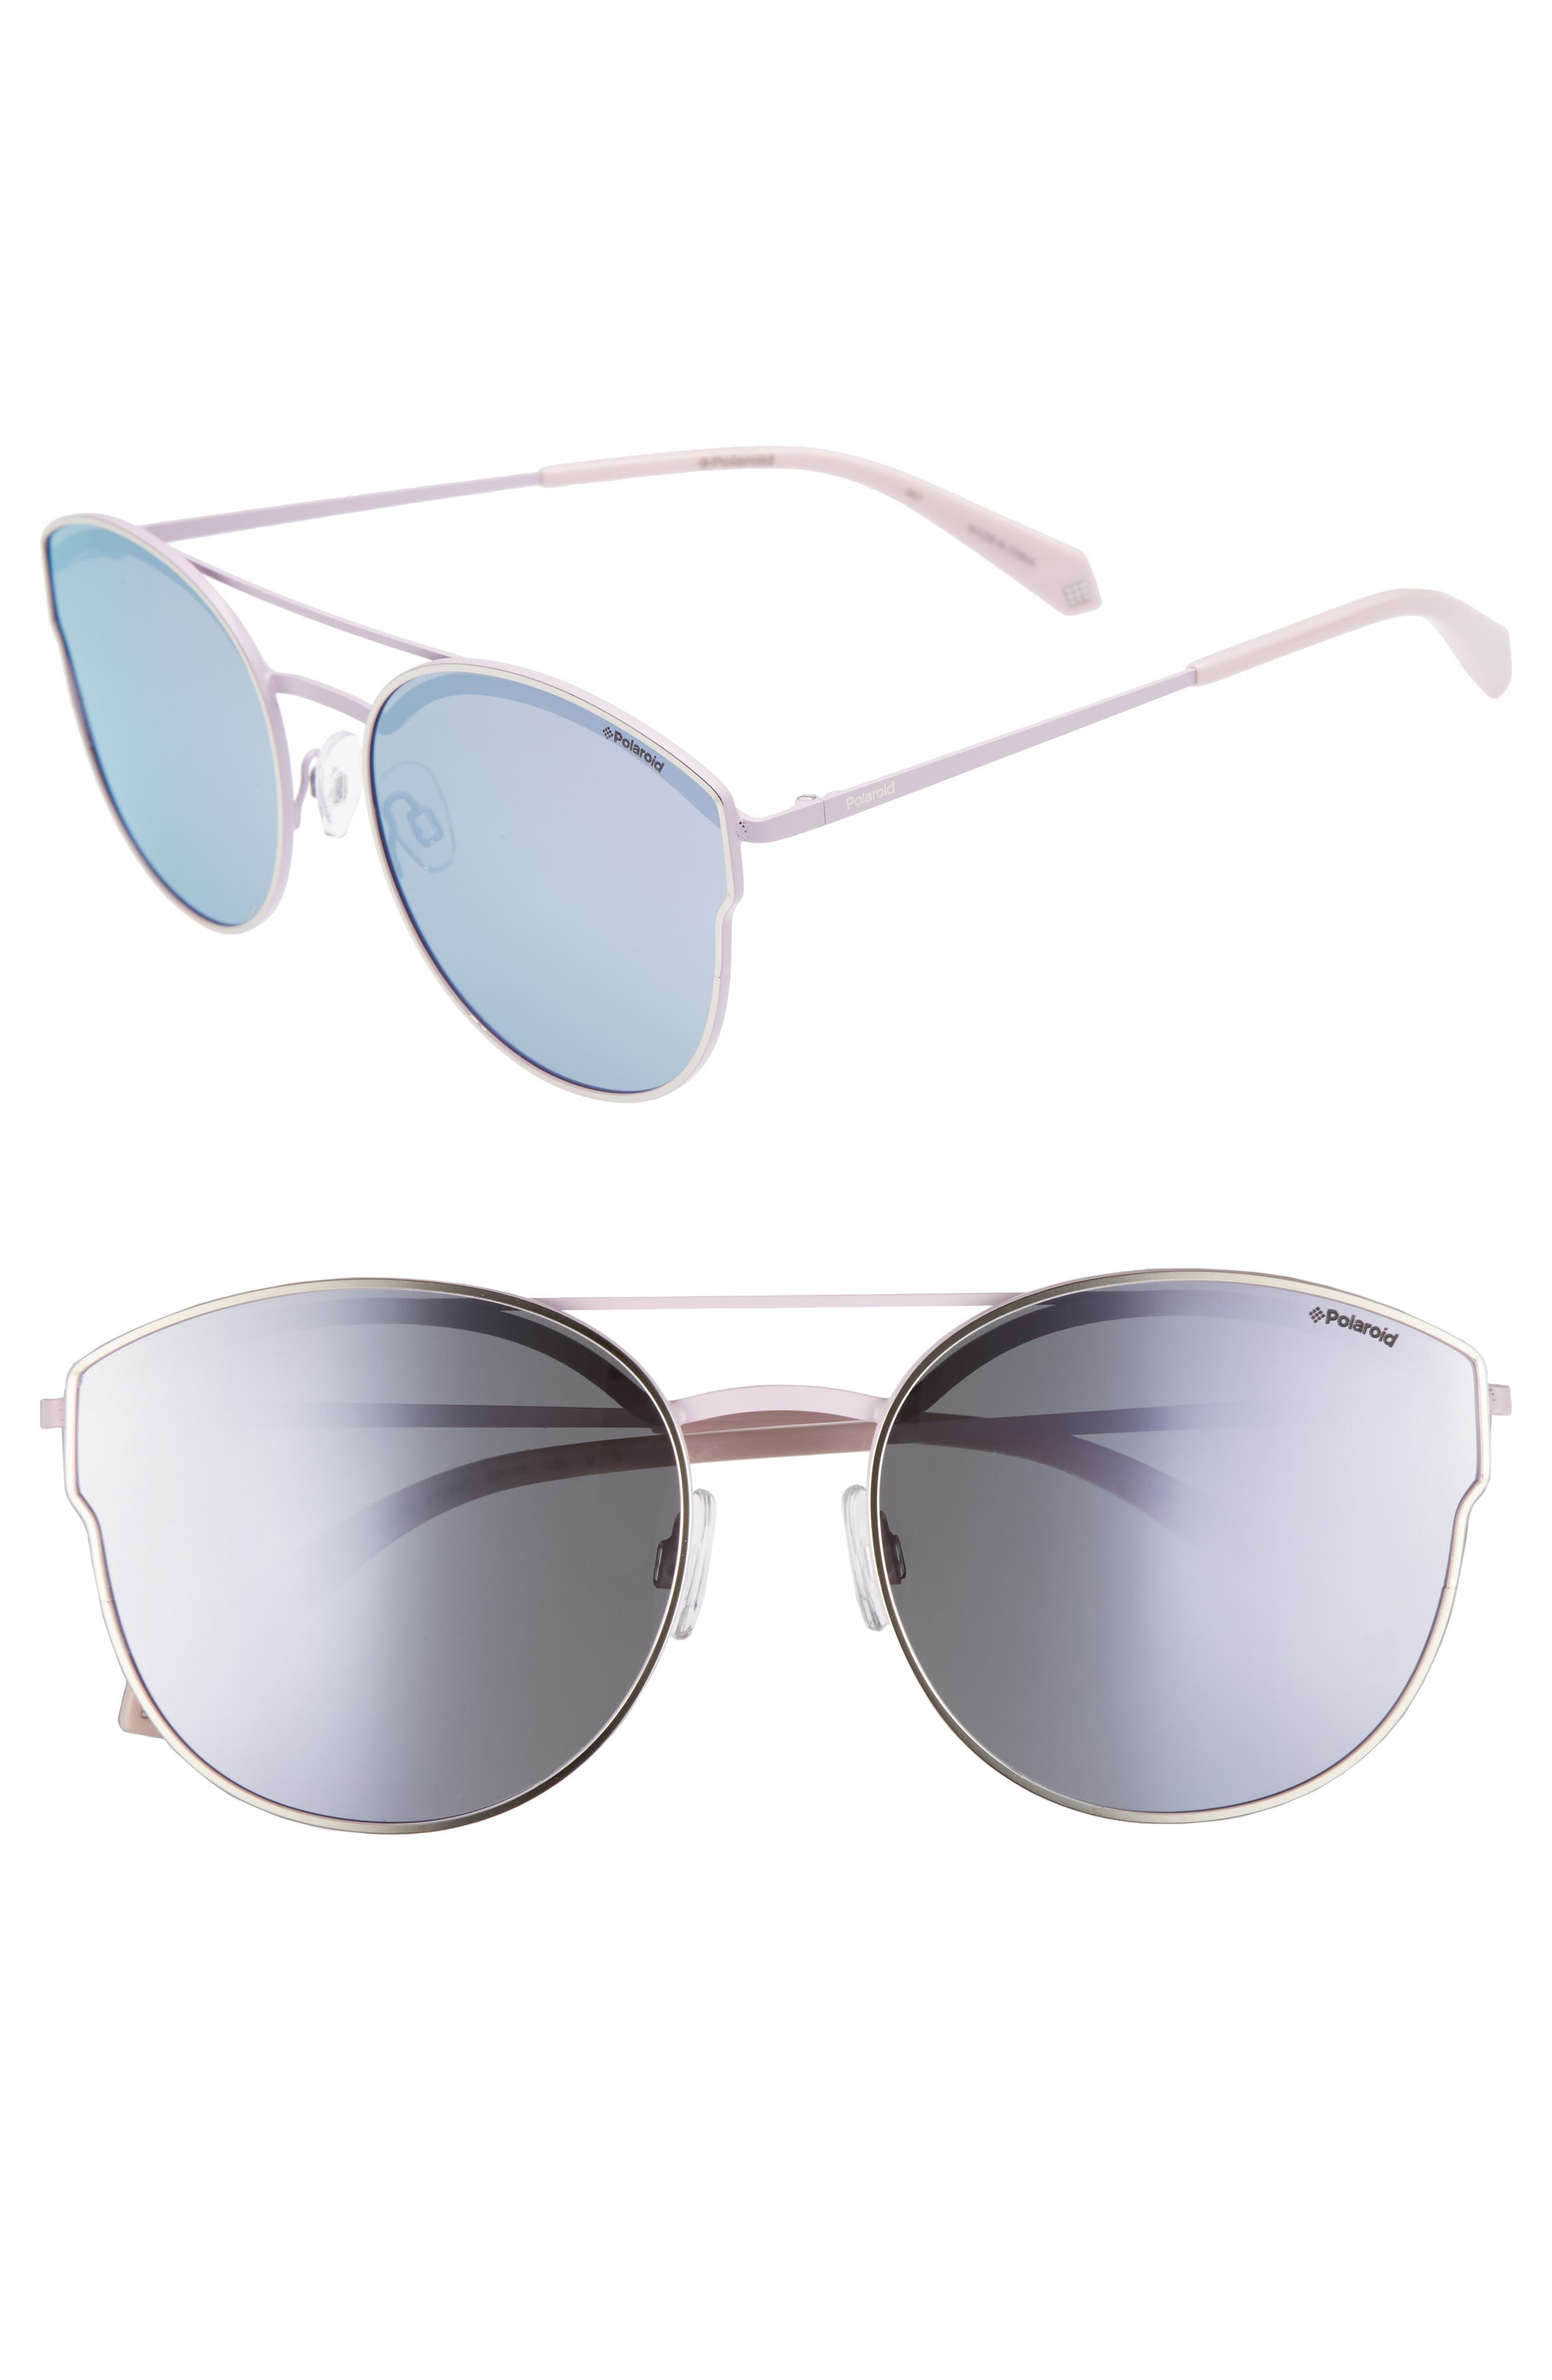 60mm Polarized Round Aviator Sunglasses,                             Main thumbnail 1, color,                             Light Gold